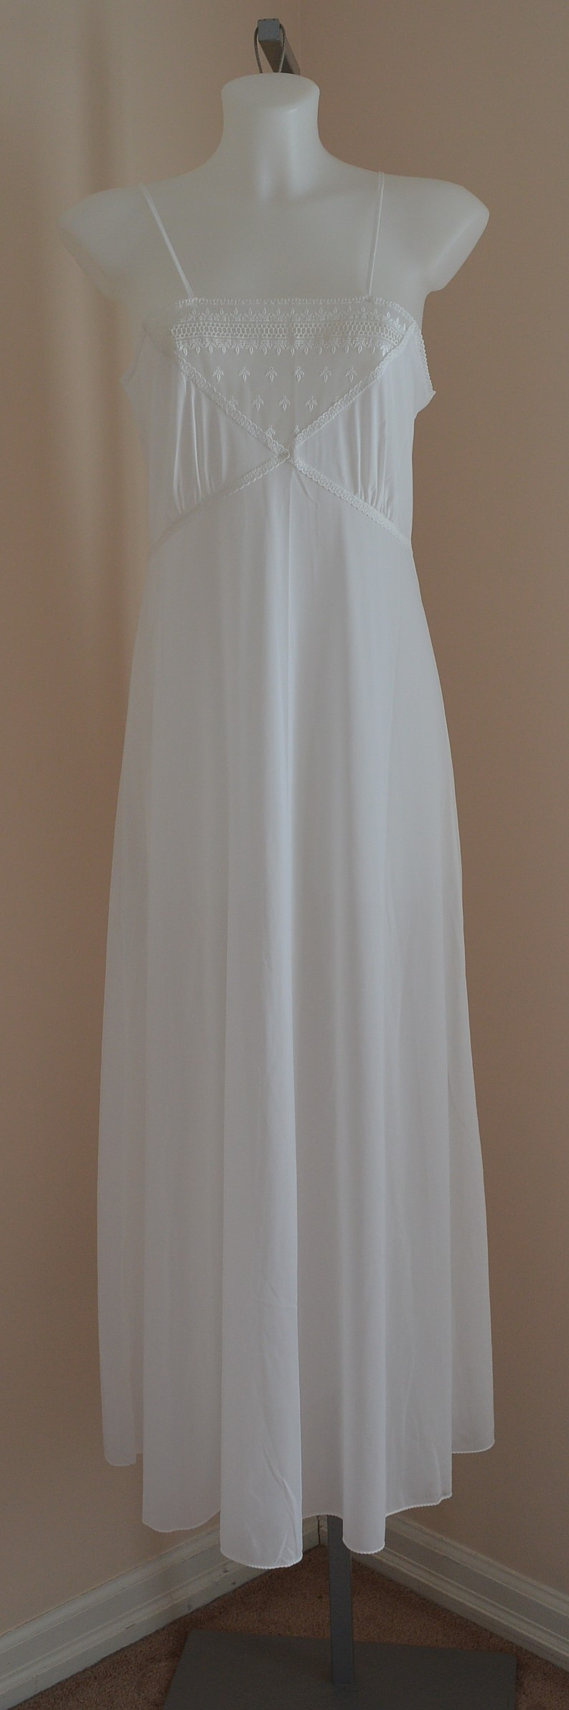 Hochzeit - Vintage White Nightgown, Vintage Nightgown, Vintage Nightgowns, Wedding, Bridal, Romantic, Summer, Lingerie, Vintage Lingerie, Sleep Wear